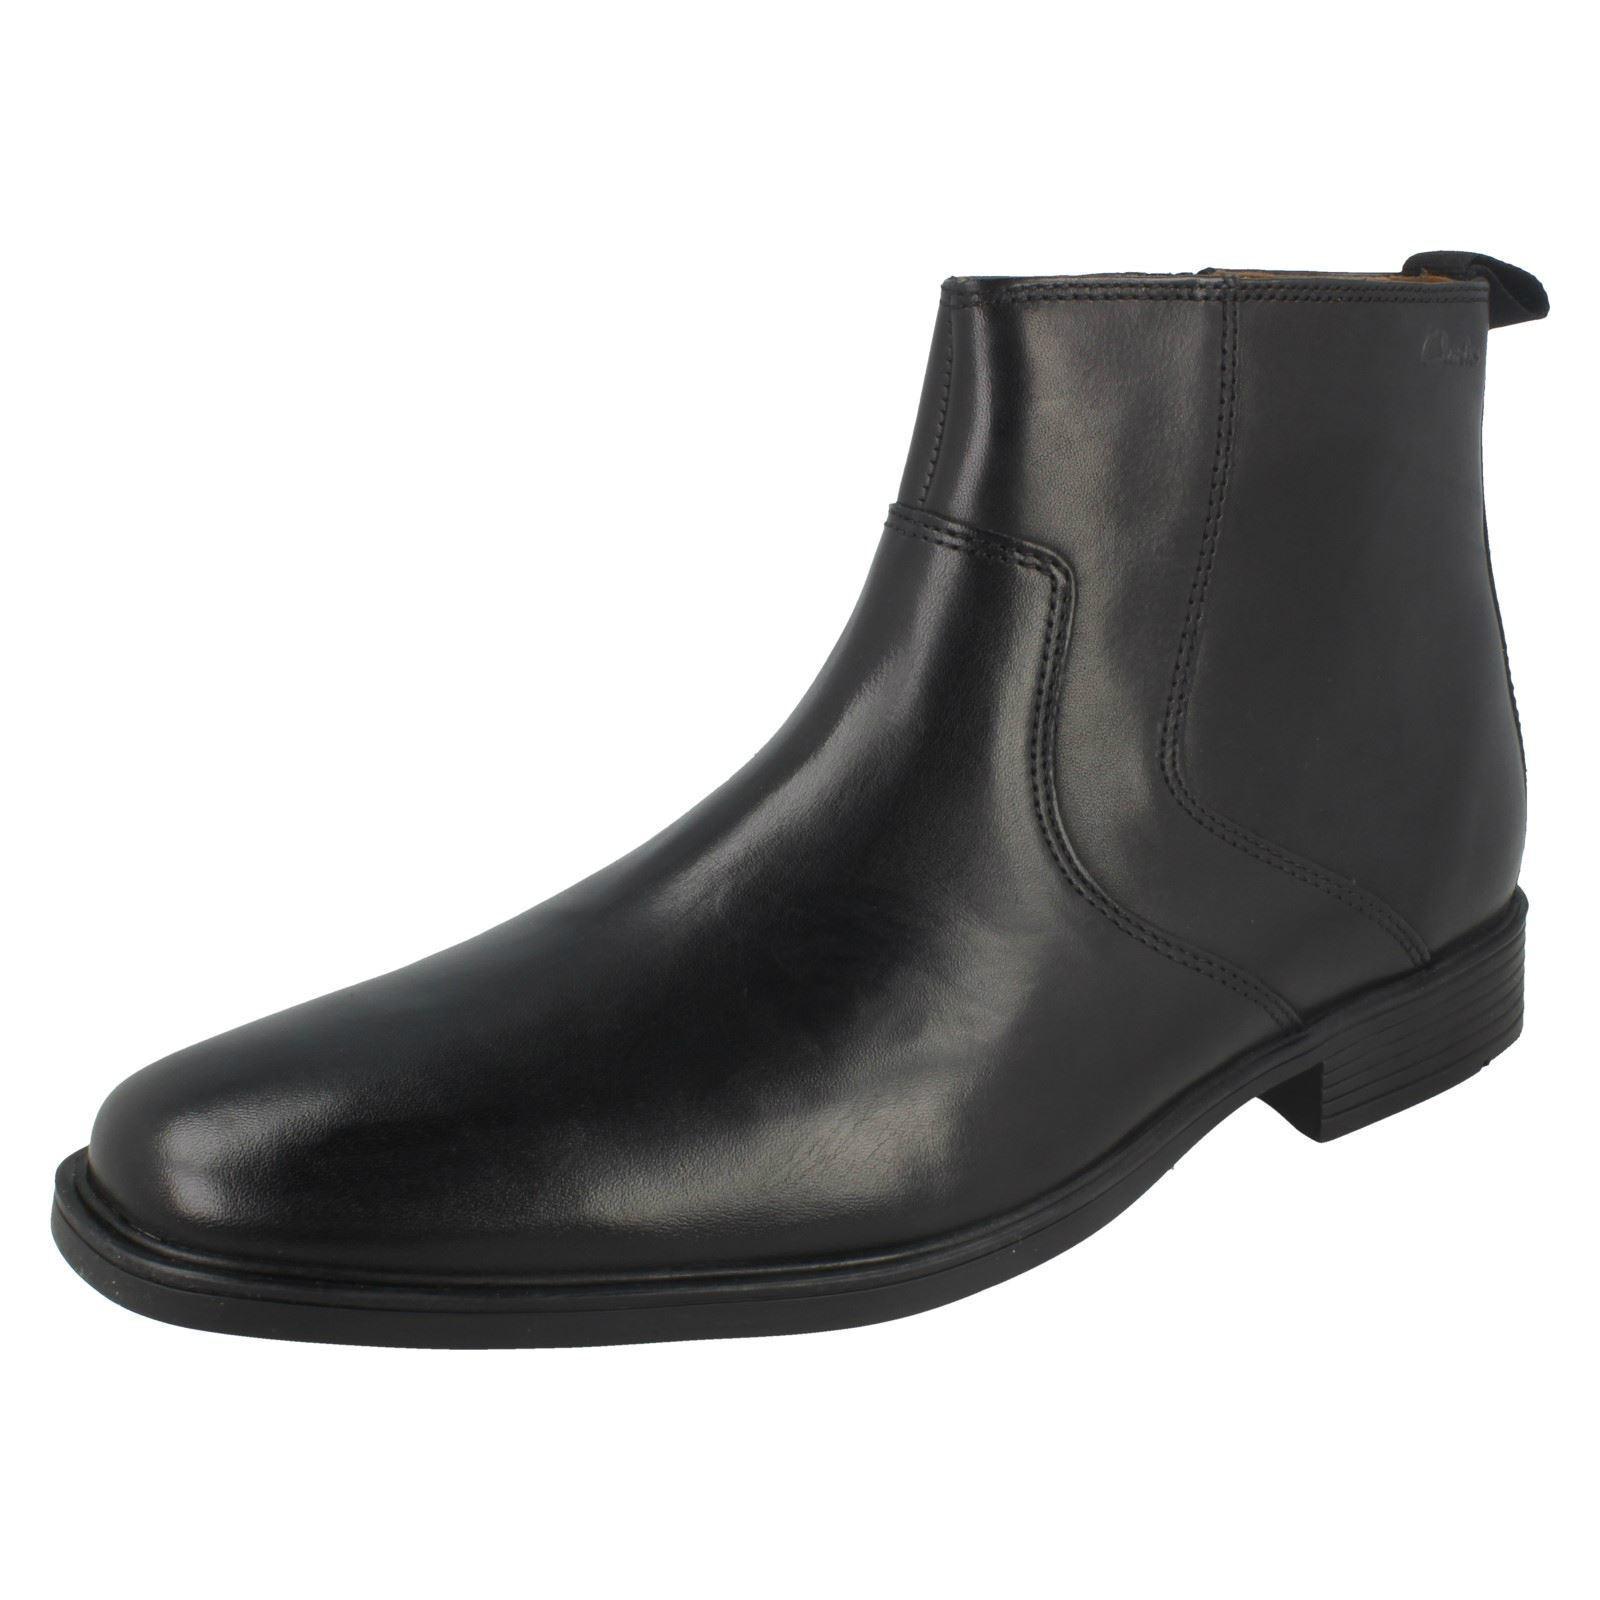 Clarks botas al tobillo para hombre-Tilden Zip